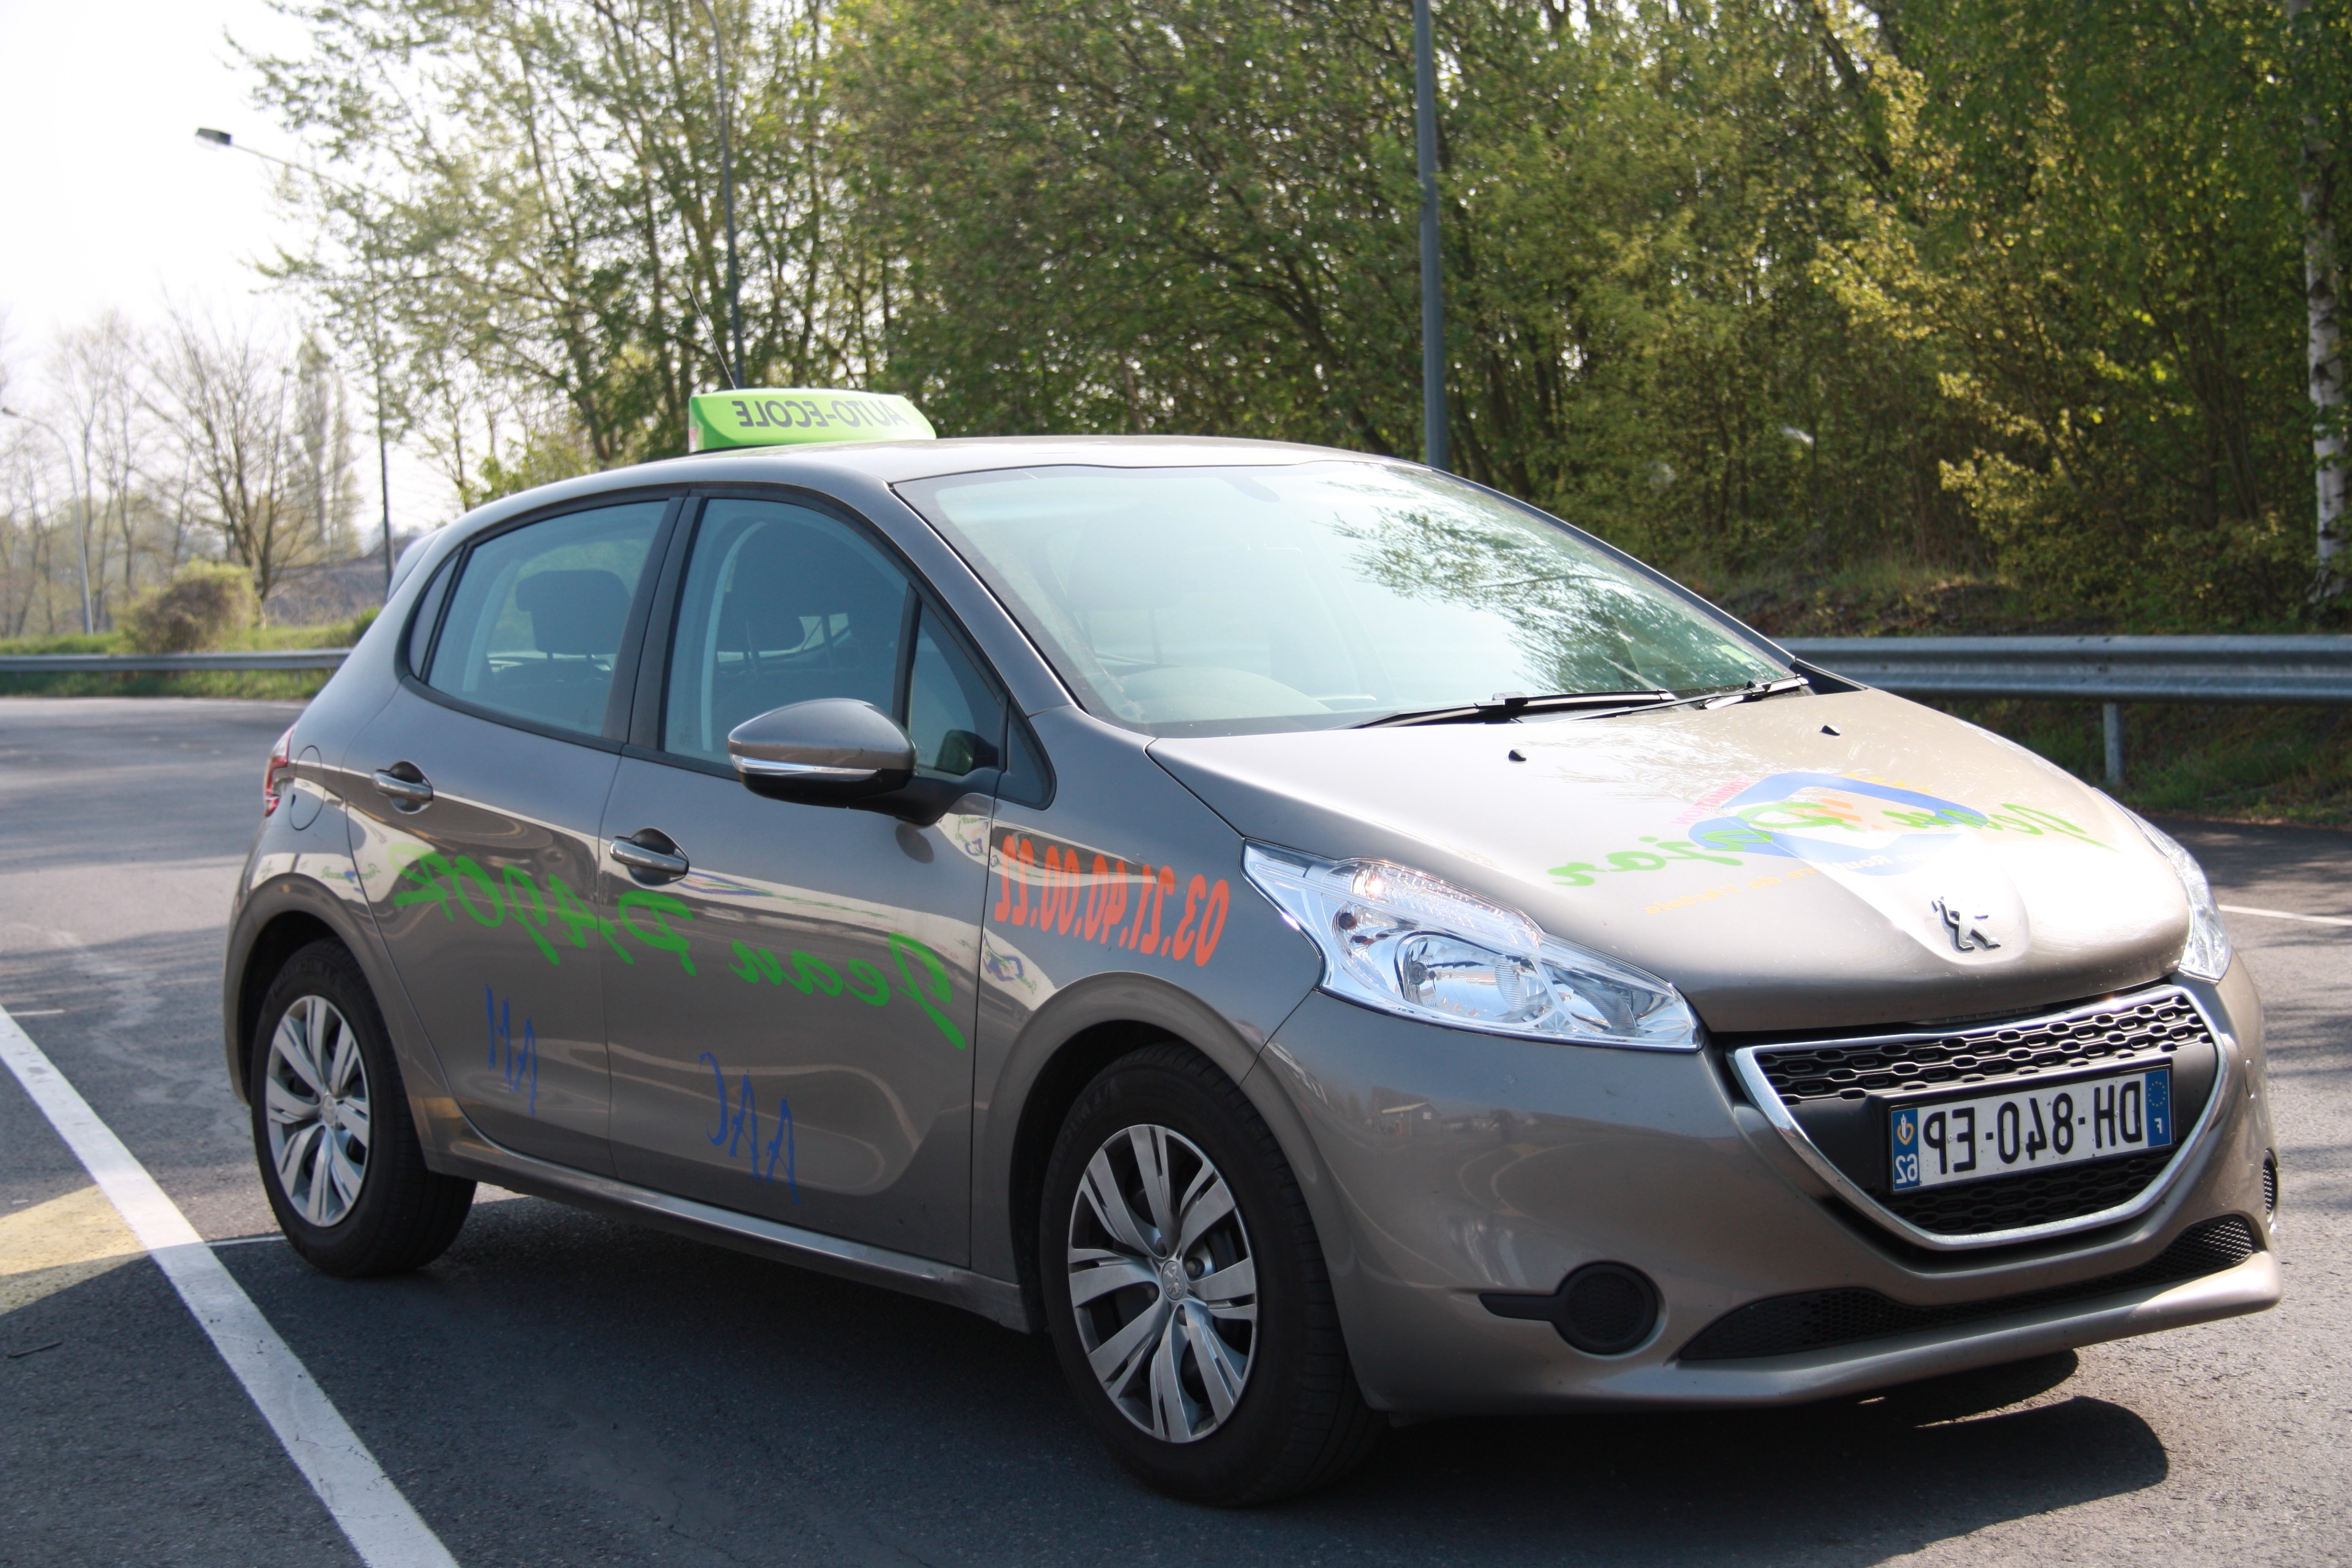 Permis de conduire permis auto auto ecole jean pajor for Reglement interieur auto ecole